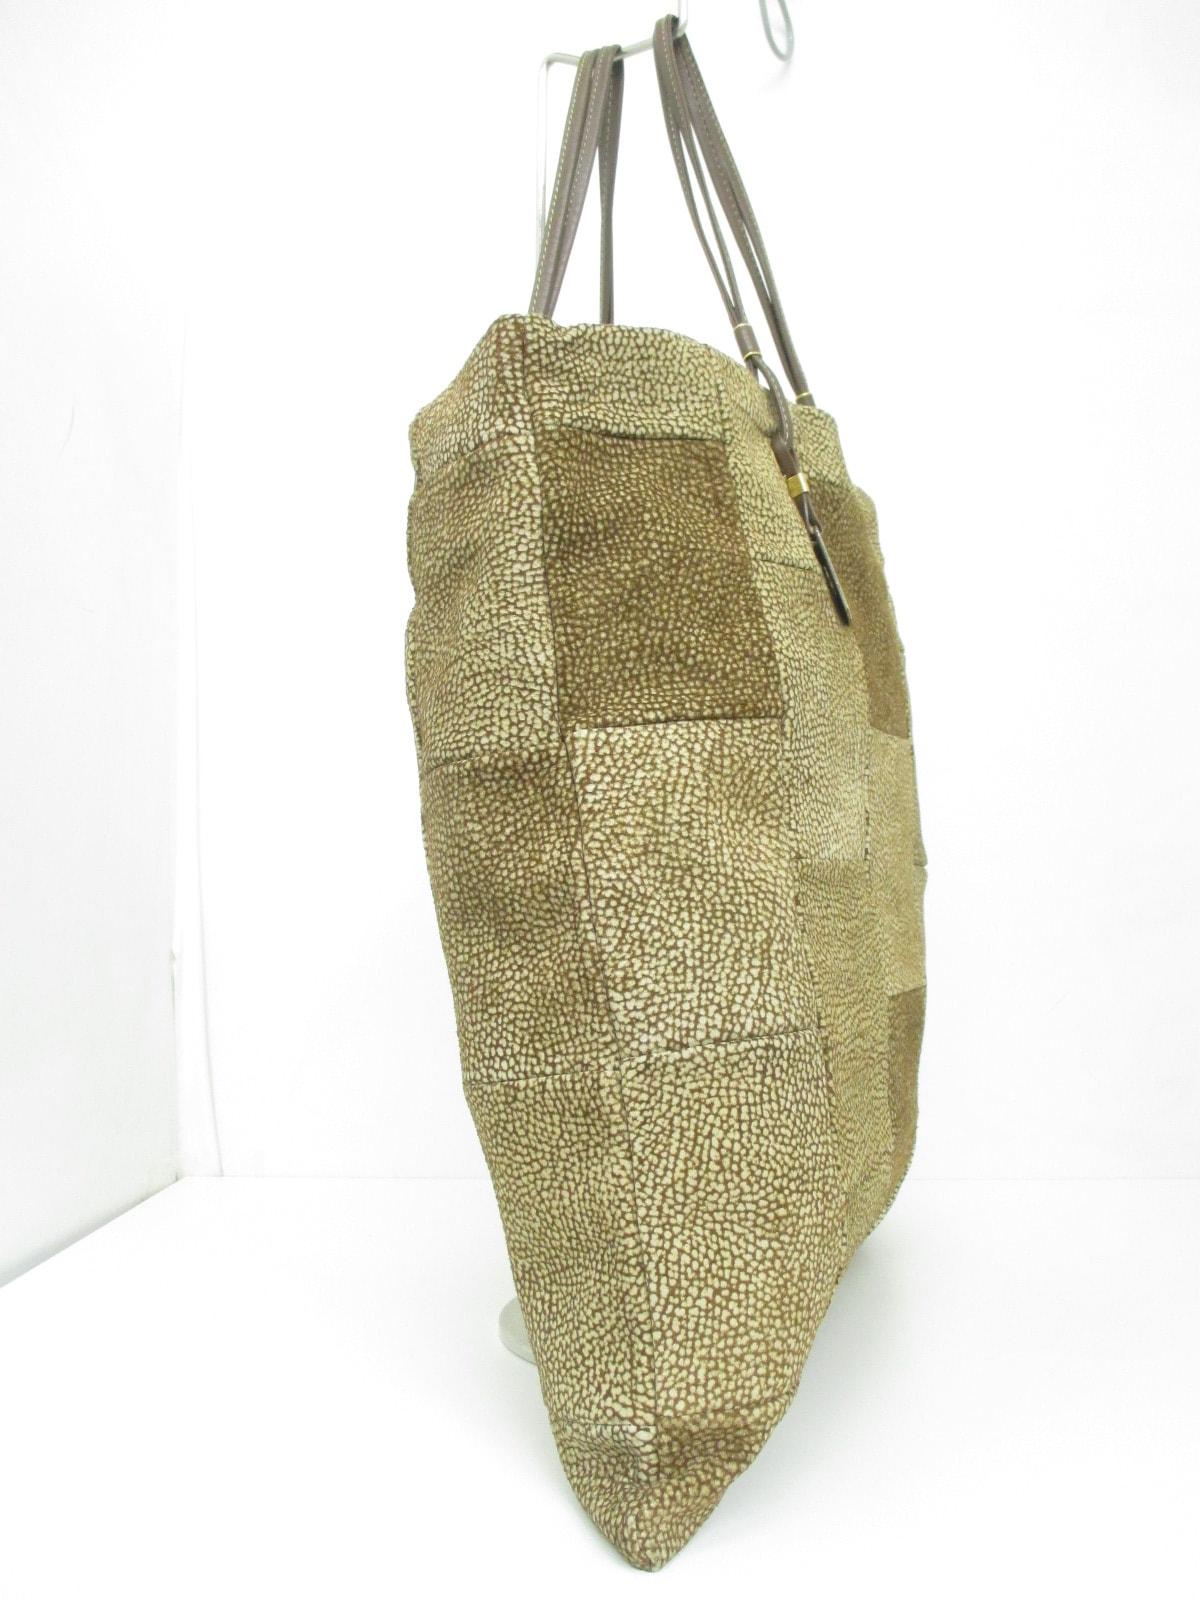 redwall BORBONESE(レッドウォールボルボネーゼ)のトートバッグ